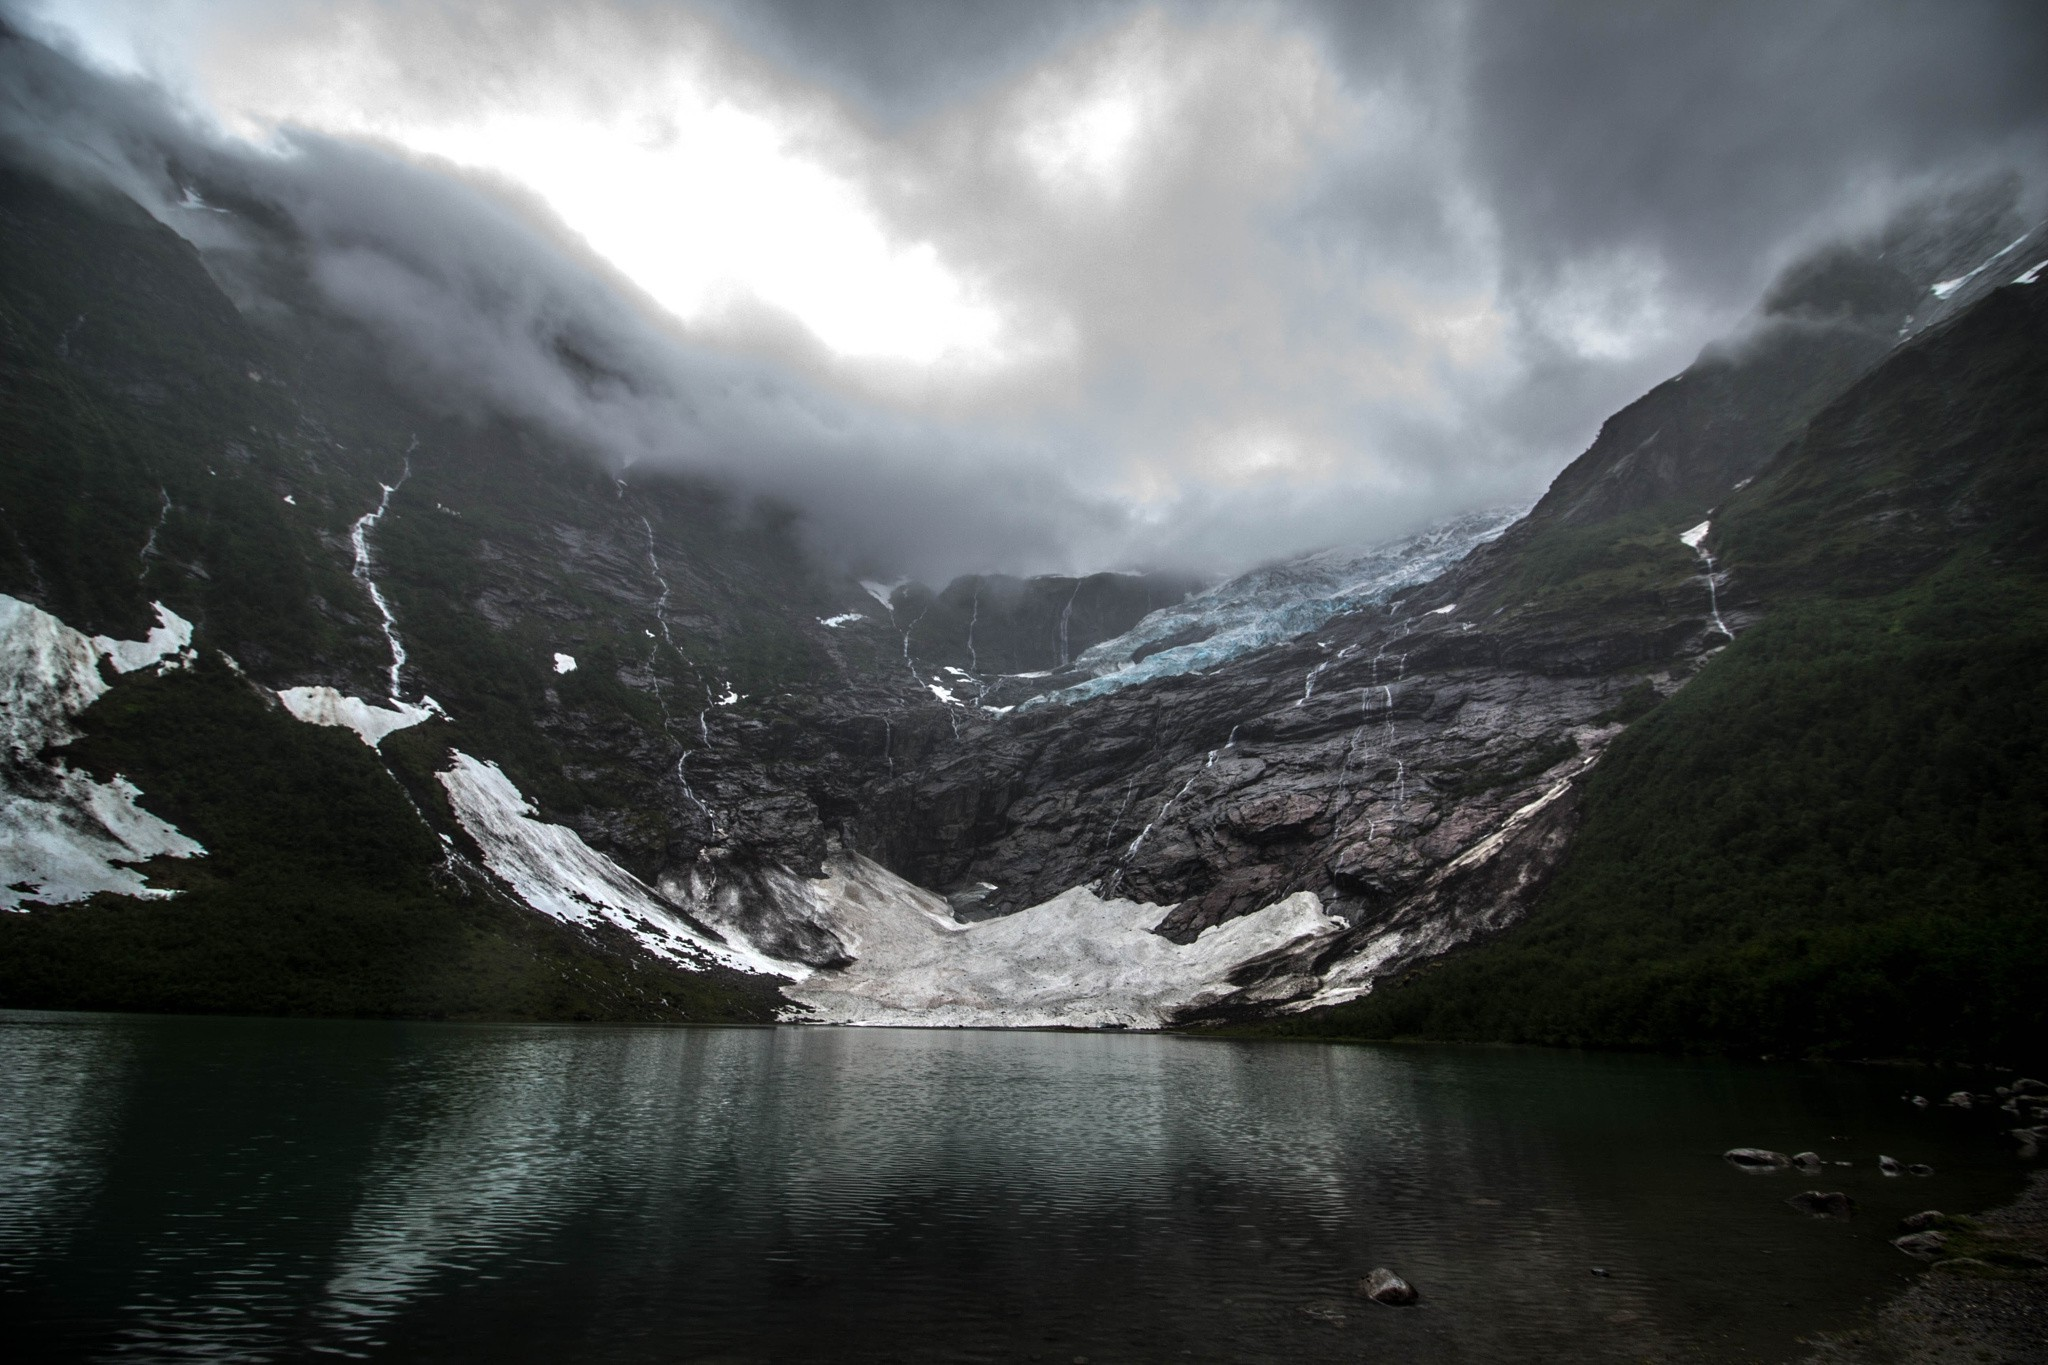 Great Wallpaper Mountain Dark - 1098466-new-dark-clouds-wallpaper-2048x1365-desktop  Graphic_82683.jpg